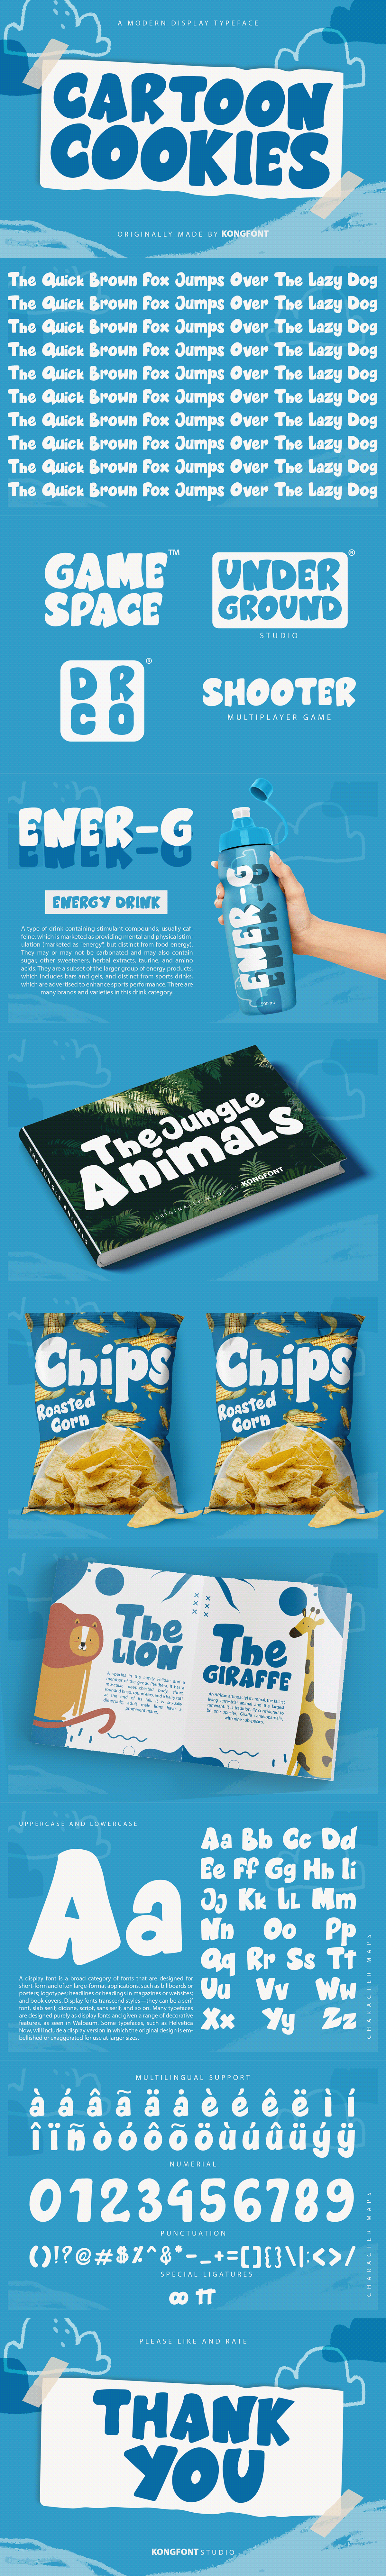 Birthday branding  cartoon cookies cute Display font font design fonts Invitation kids